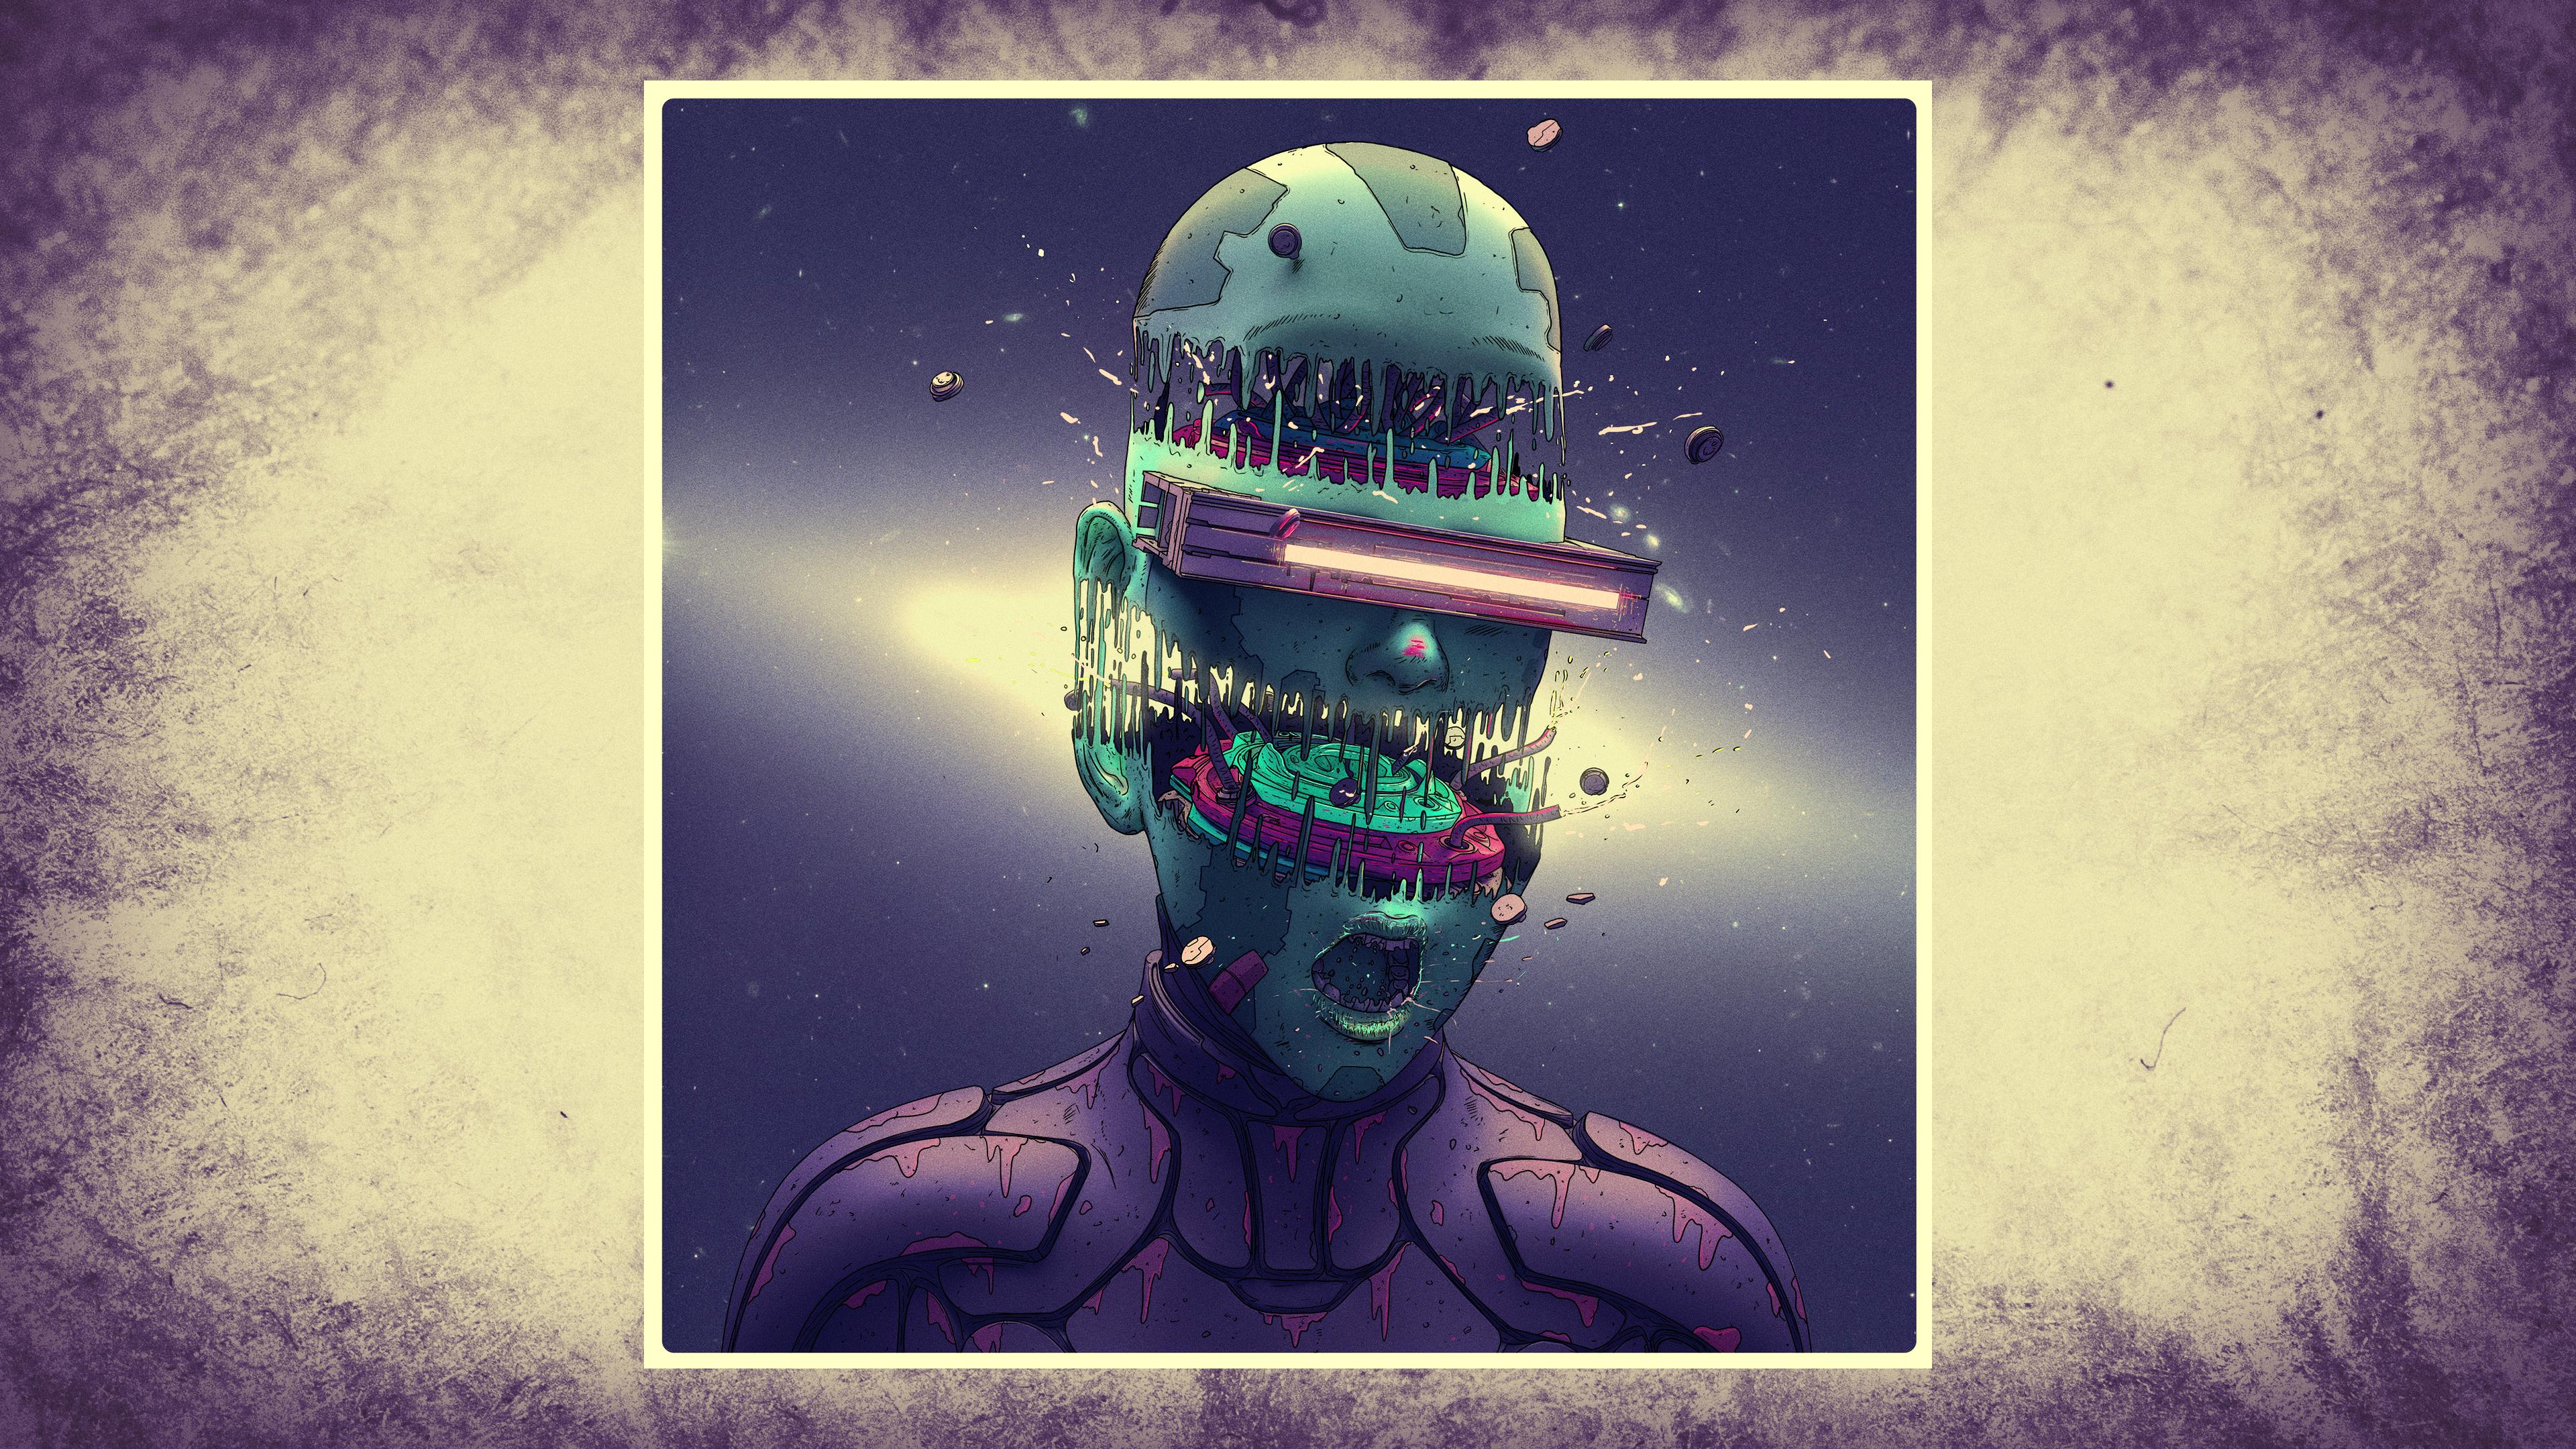 General 3840x2160 futuristic science fiction digital art concept art artwork fantasy art fan art 3D CGI painting closeup realistic cyberpunk cyber